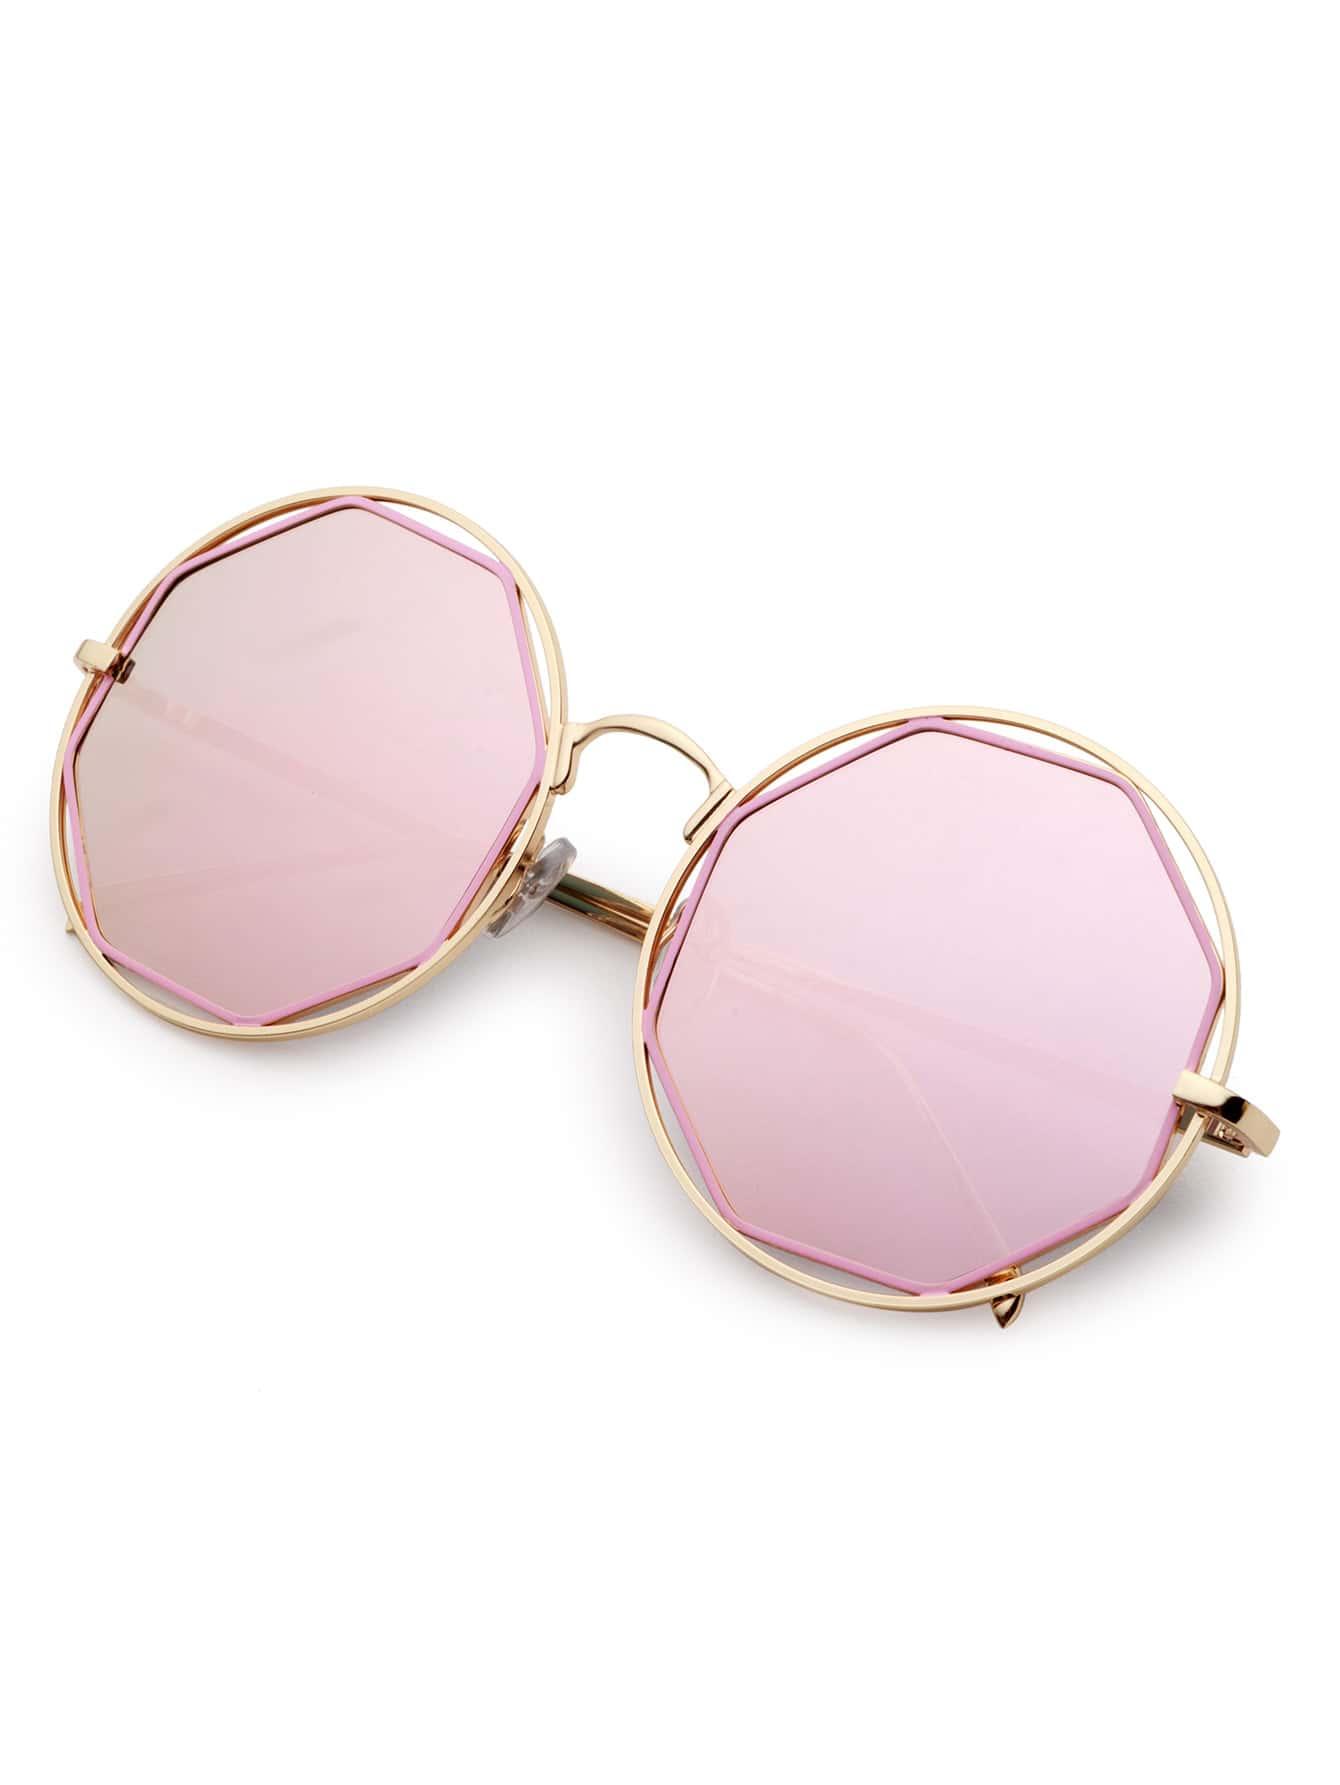 lunettes de soleil creux monture dor verre rose french romwe. Black Bedroom Furniture Sets. Home Design Ideas